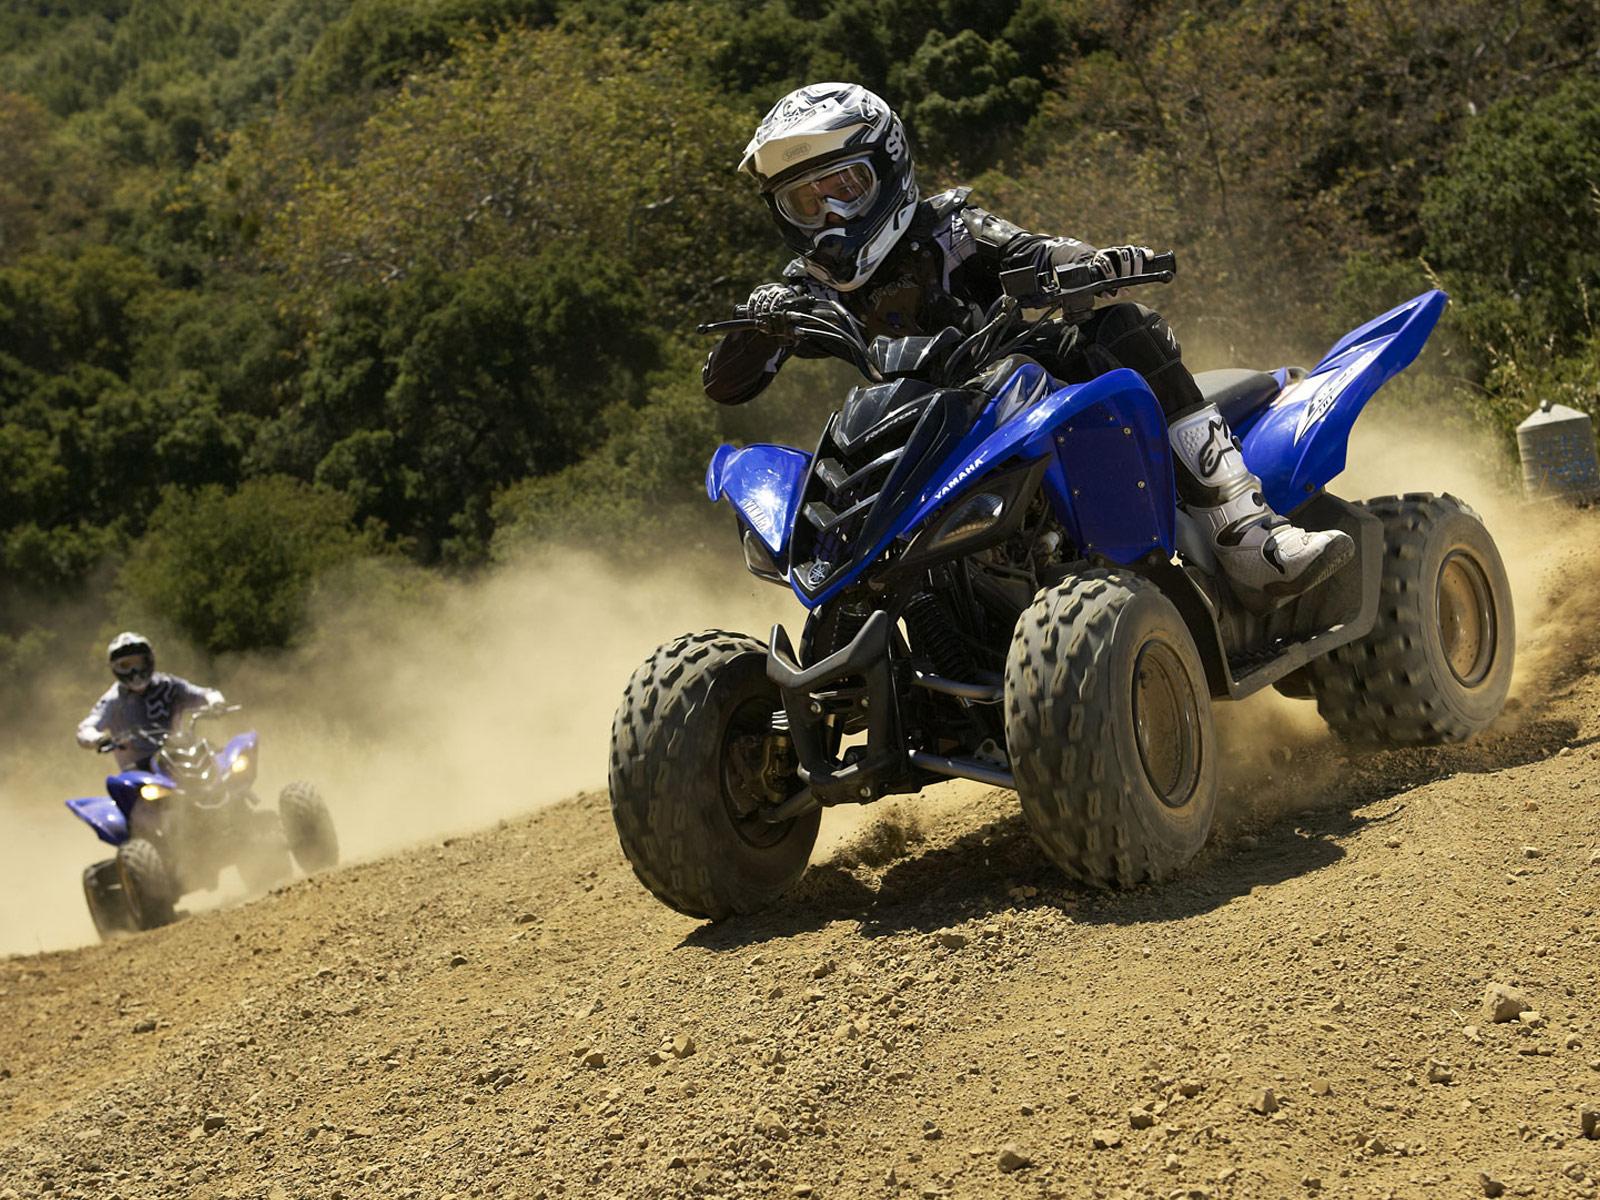 Yamaha raptor atv quad offroad motorbike bike dirtbike e wallpaper 1600x1200 191124 wallpaperup